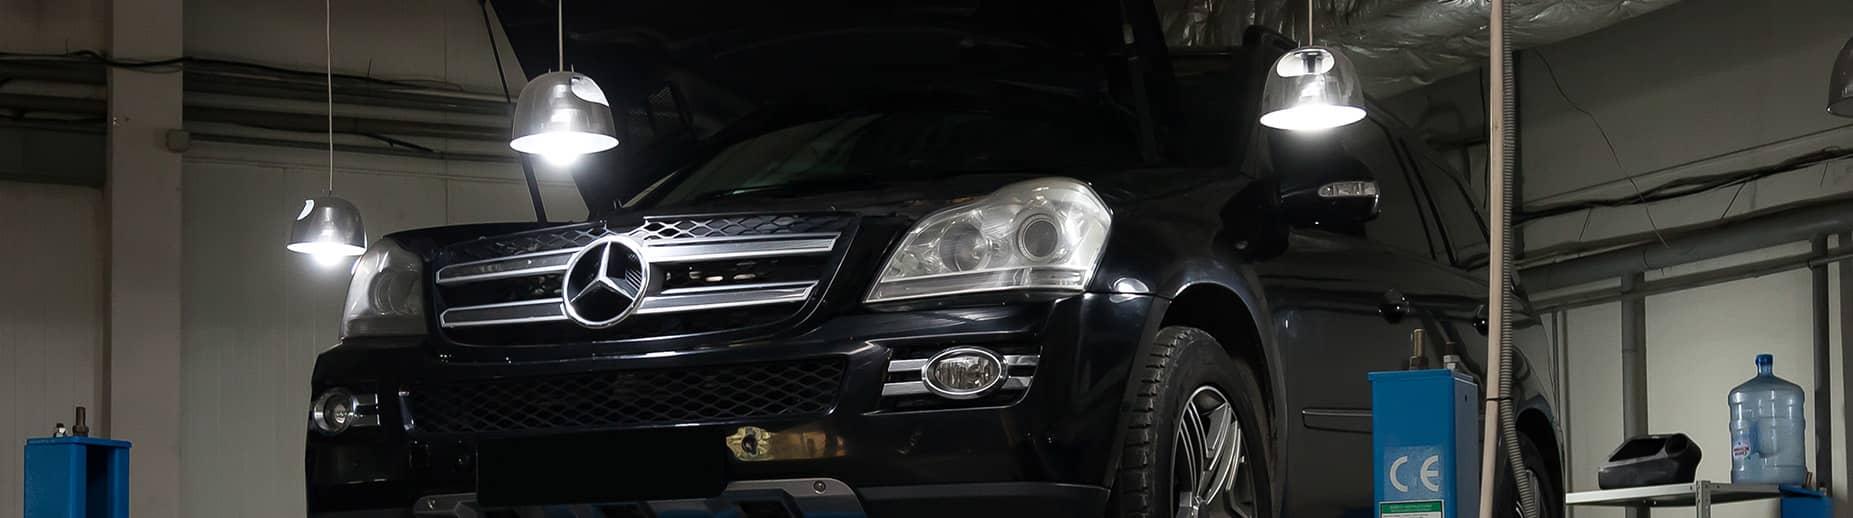 Summerlin Auto Repair, Car Repair and Auto Mechanic